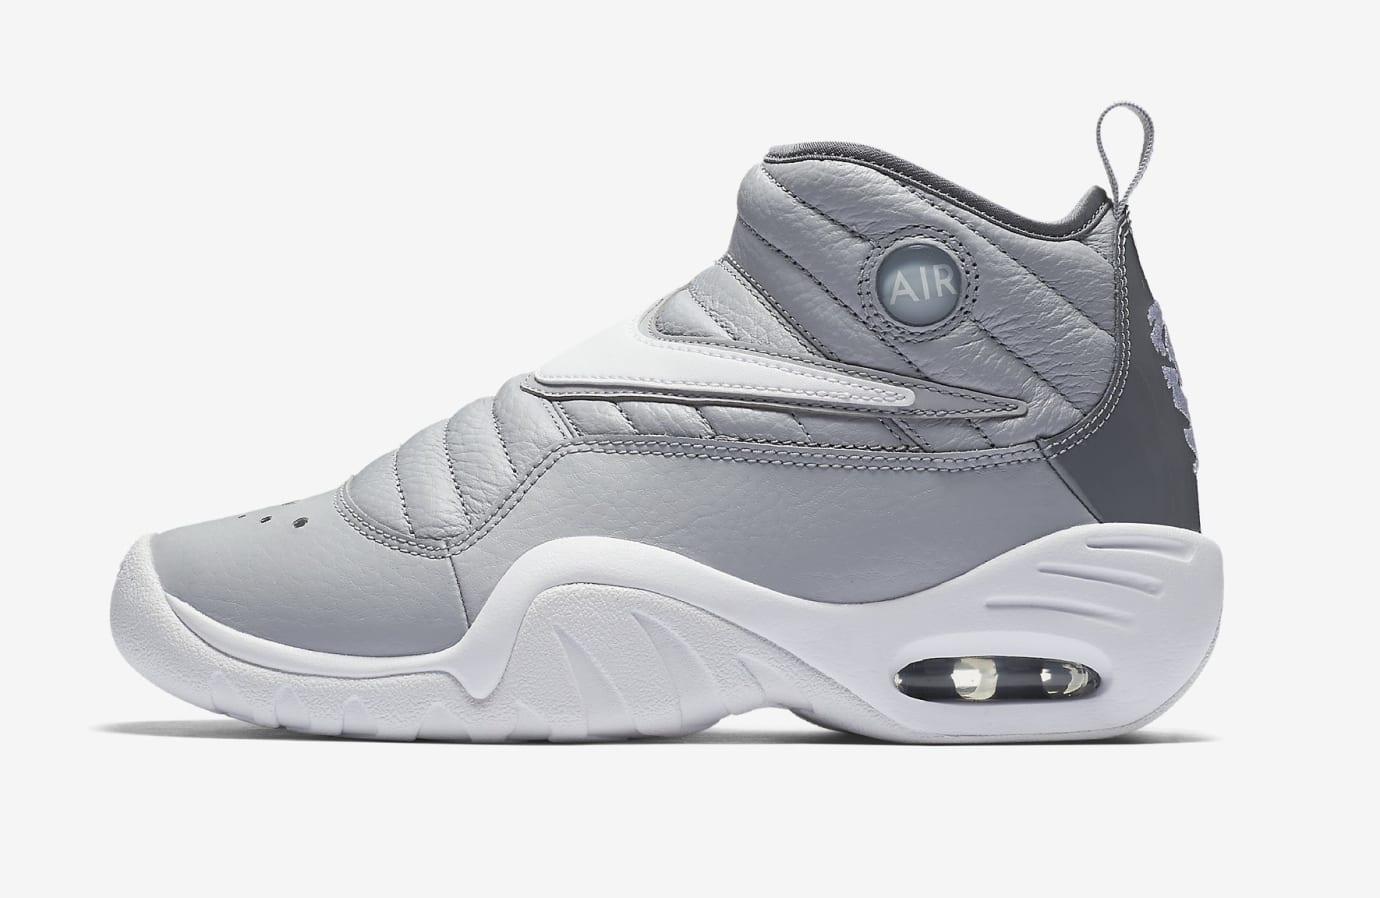 Nike Air Shake Ndestrukt 'Cool Grey' AA2888-002 (Lateral)